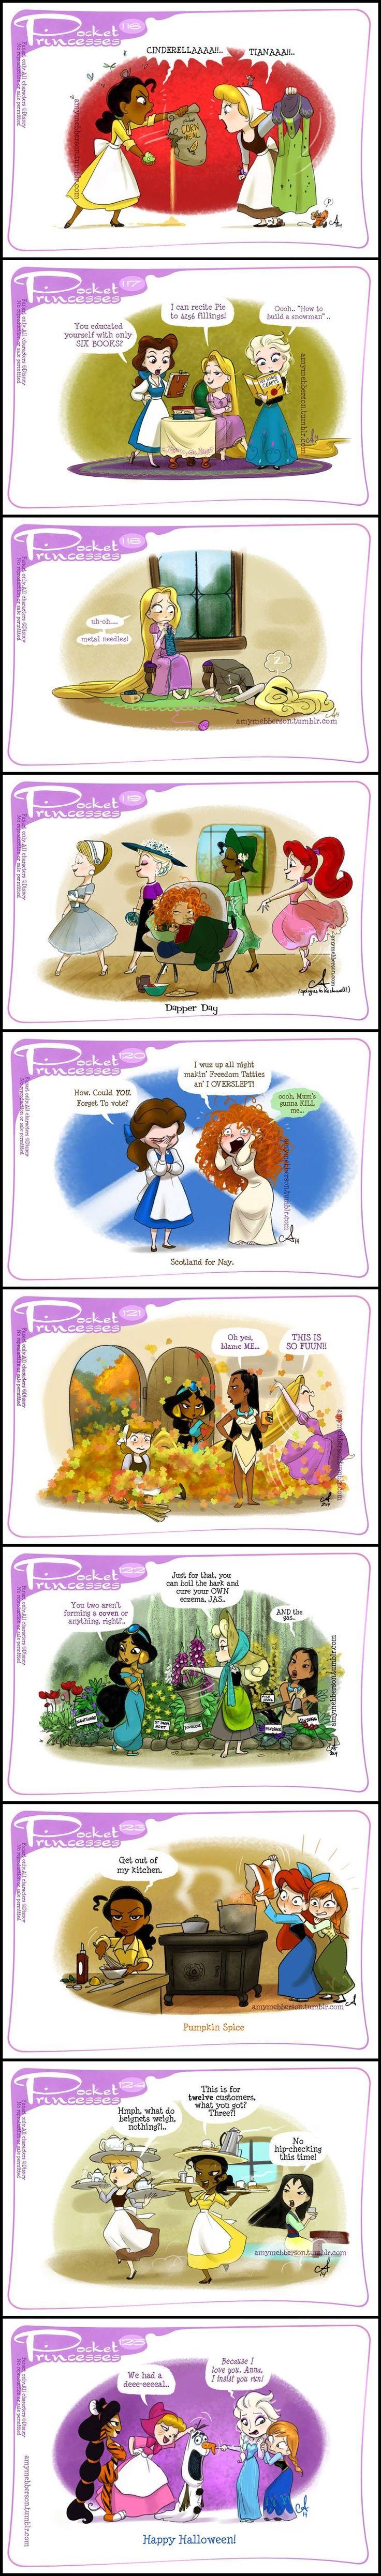 Pocket Princesses (Part 12) by Amy Mebberson